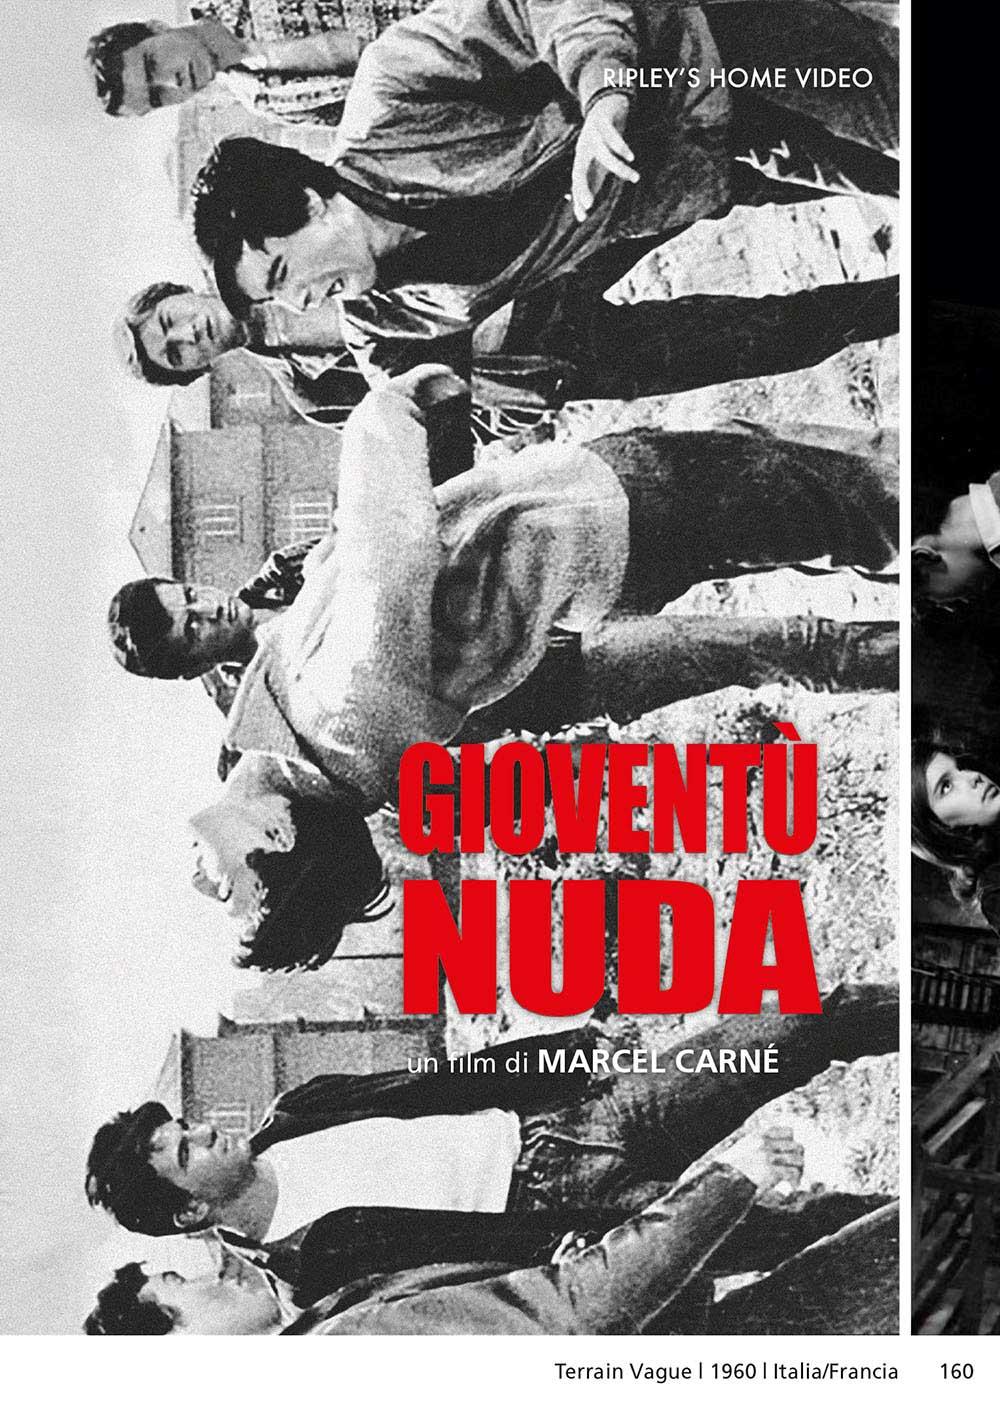 GIOVENTU' NUDA (DVD)